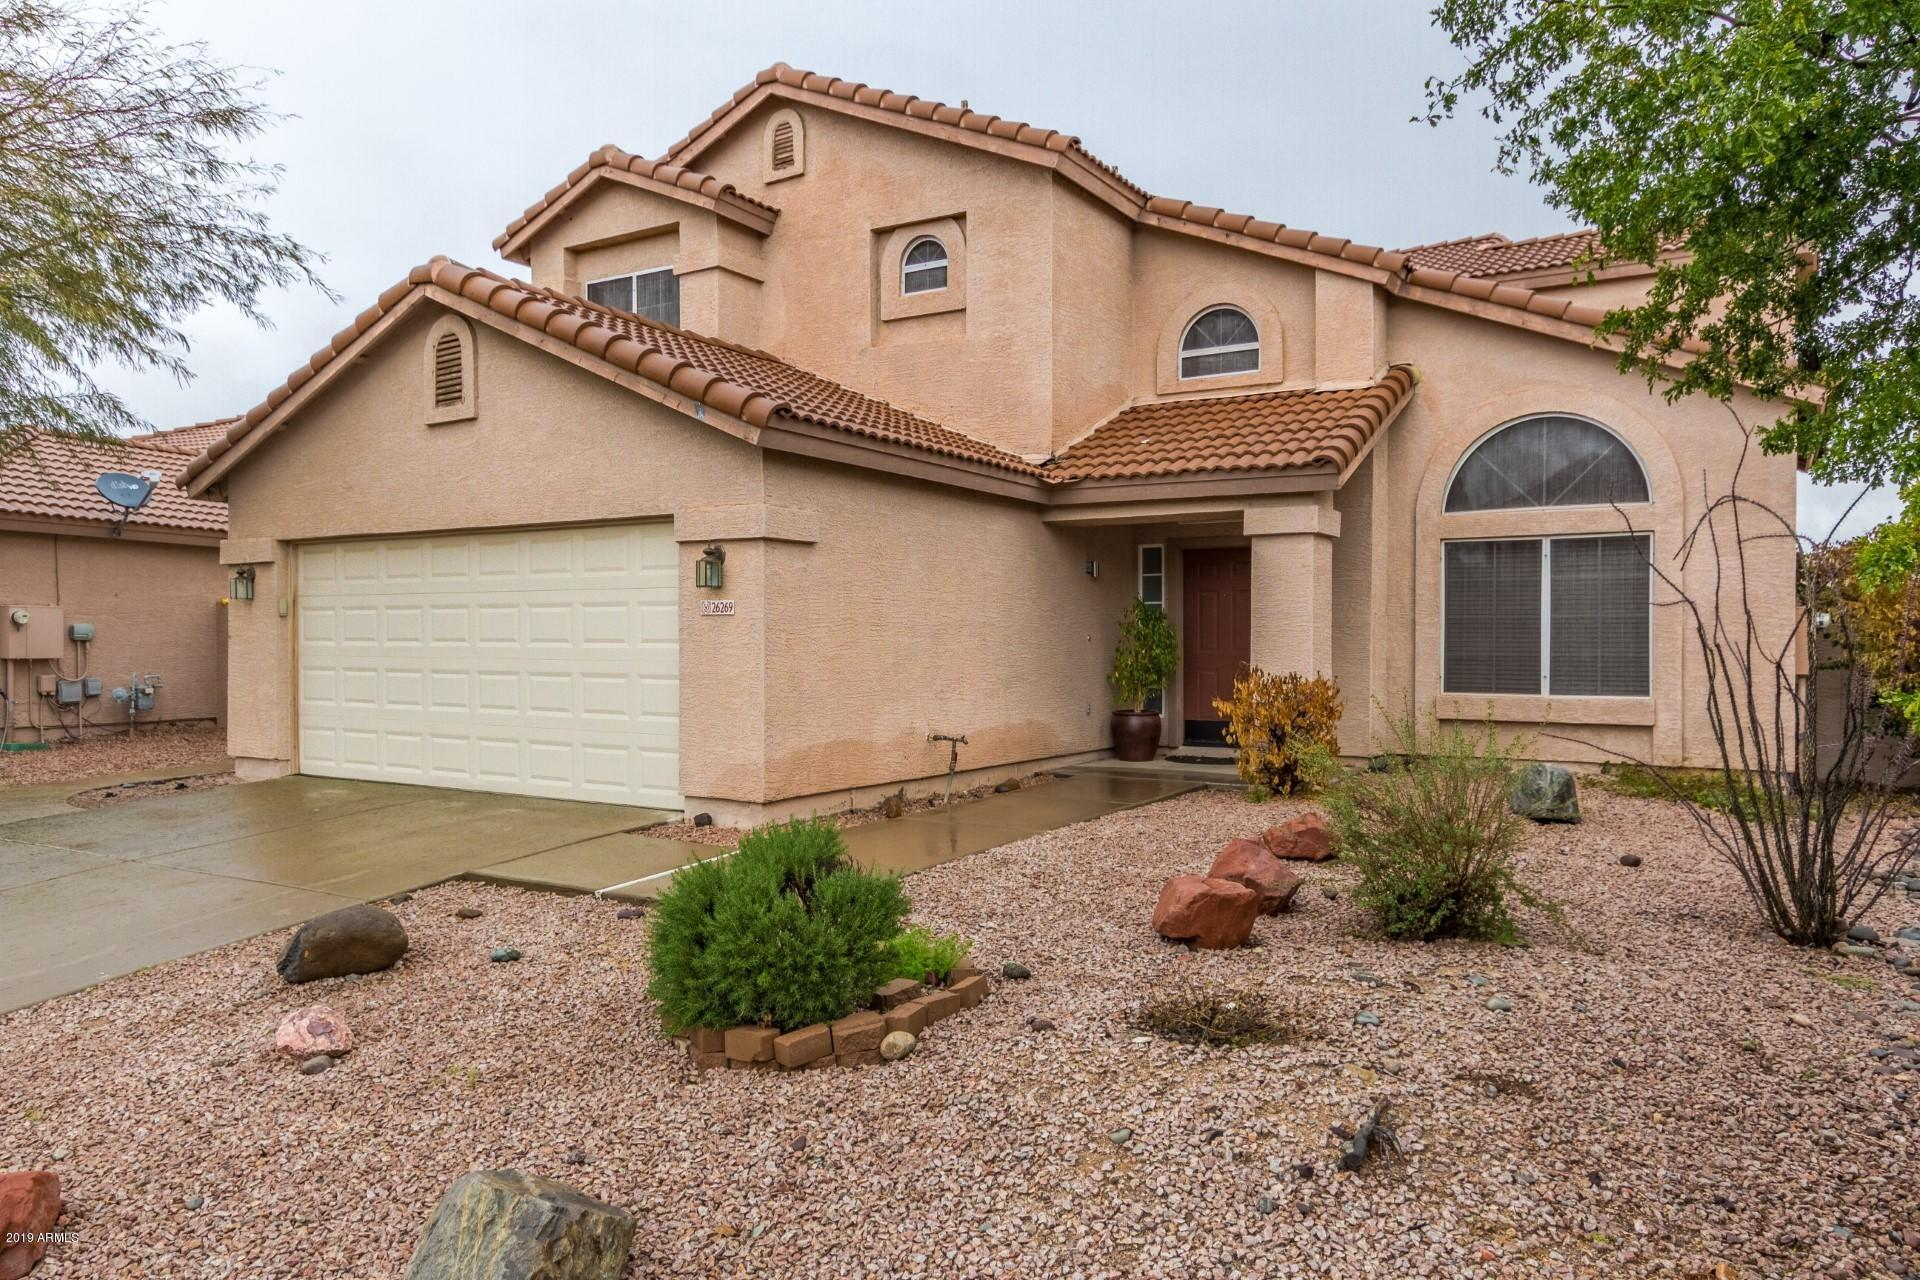 Photo of 26269 N 45TH Place, Phoenix, AZ 85050